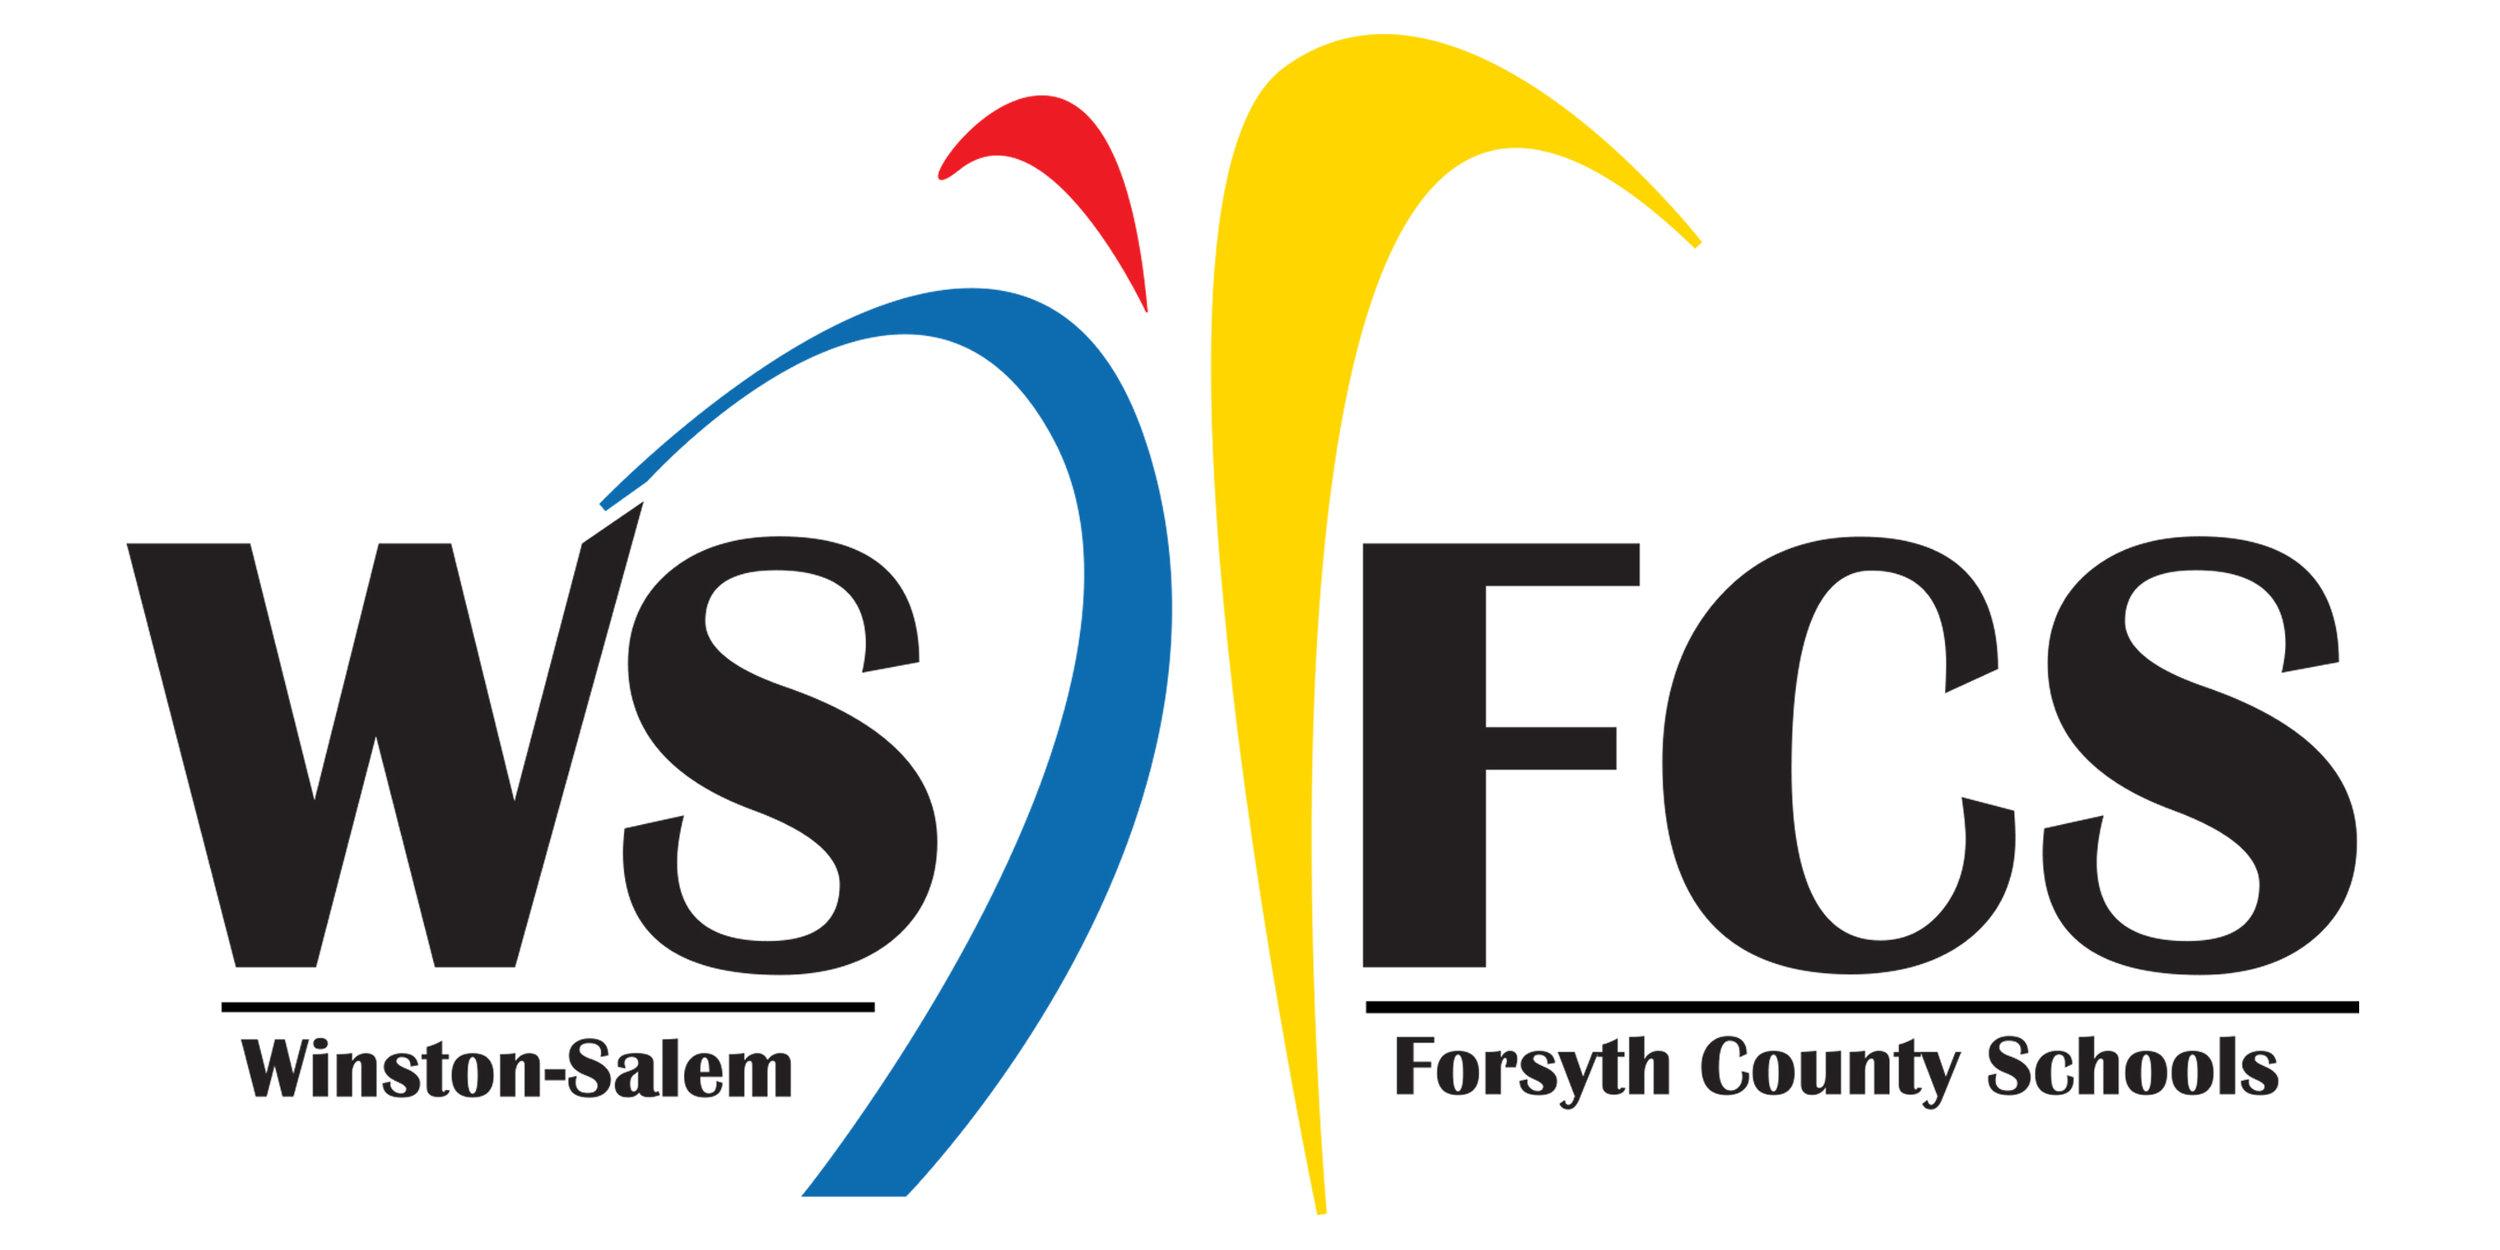 WSFCS schools logo 2015.jpg